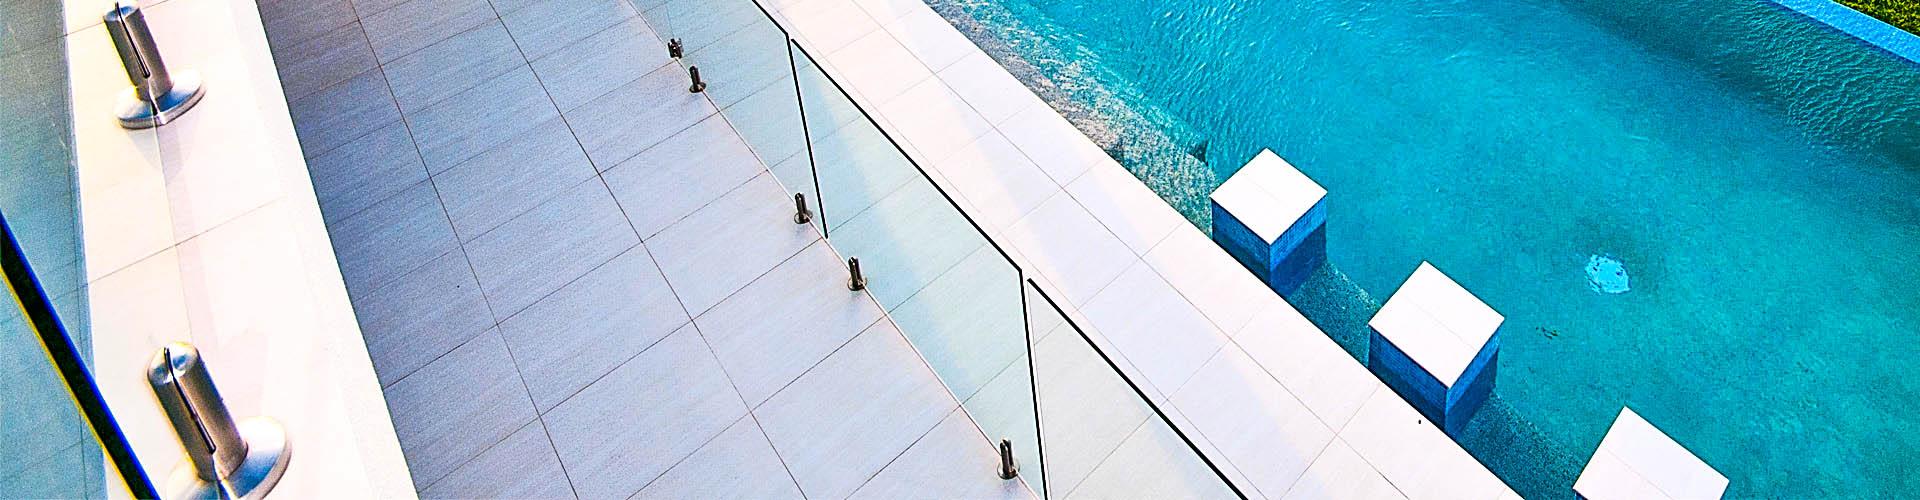 12mm Clear TGH Glass – NO HOLE Frameless – 200mmW x 1200mmH